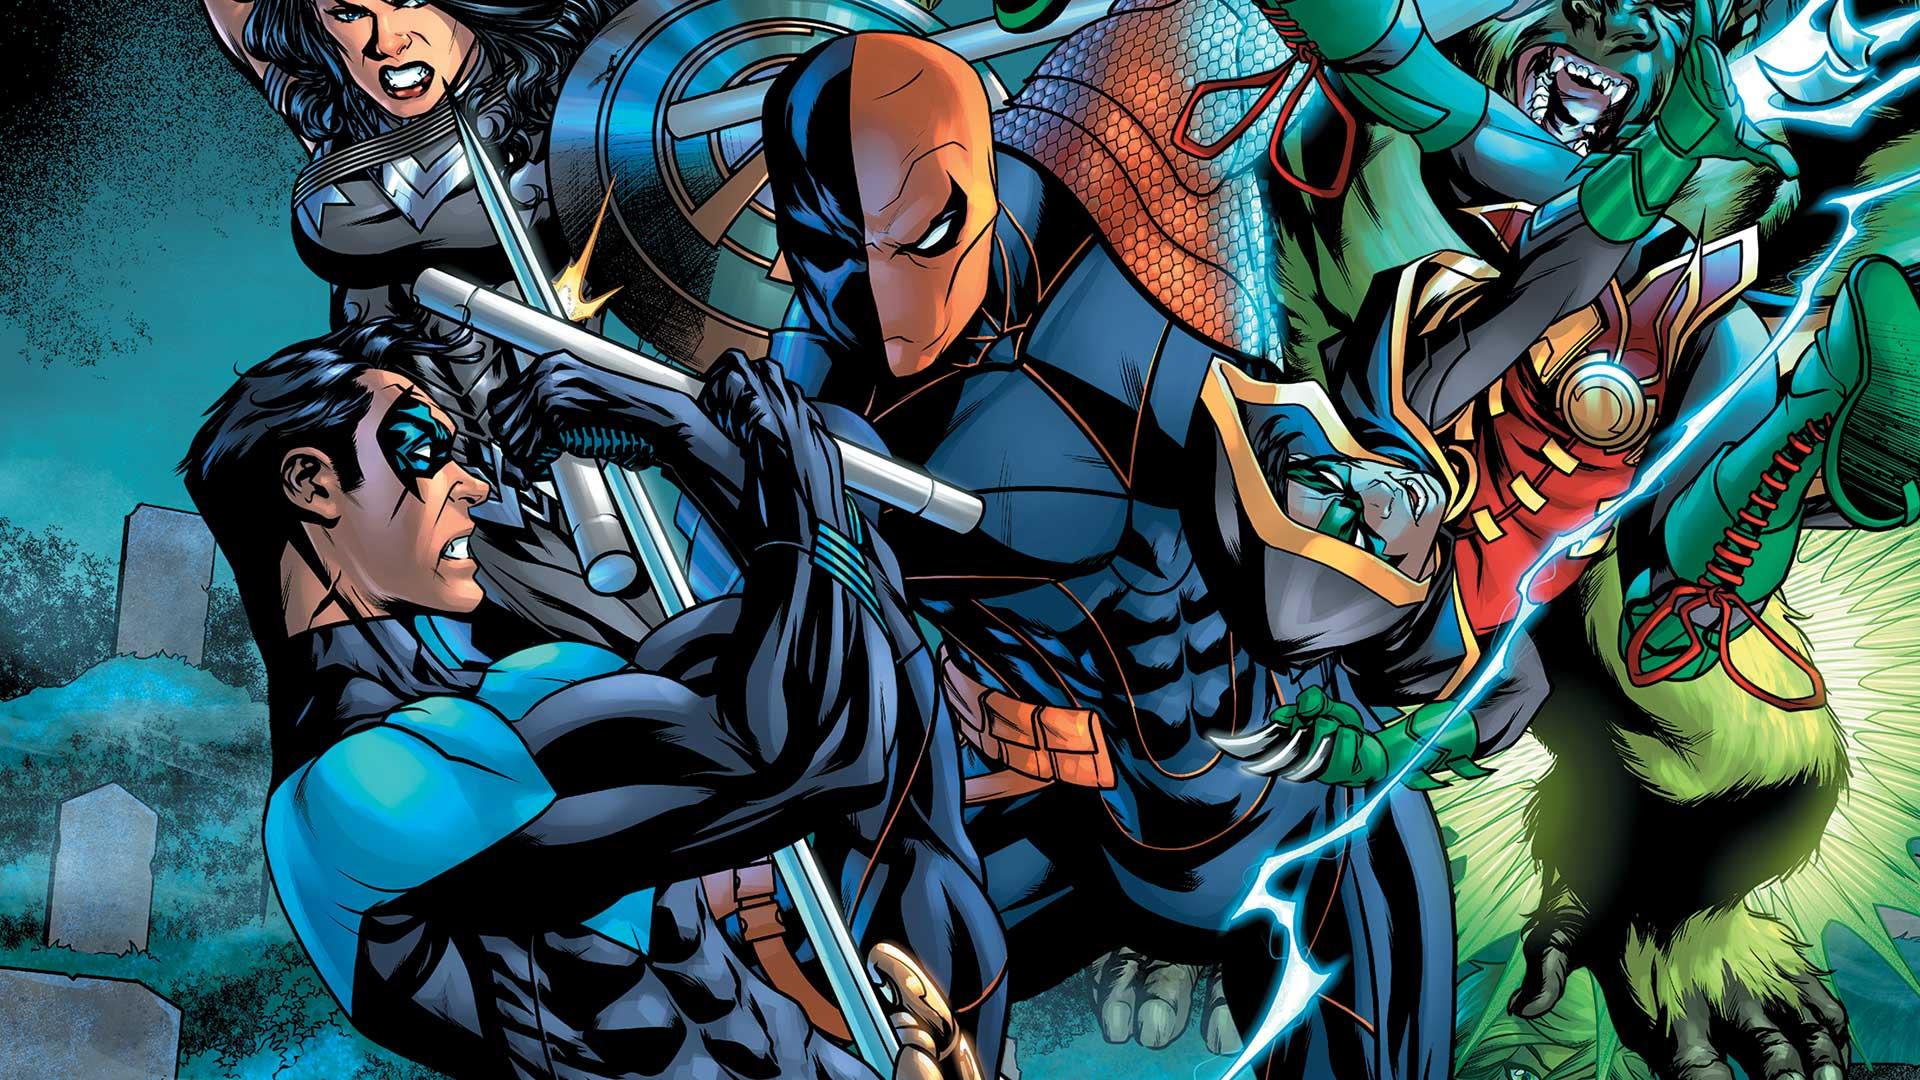 Ravager DC Comics Wallpapers - Wallpaper Cave